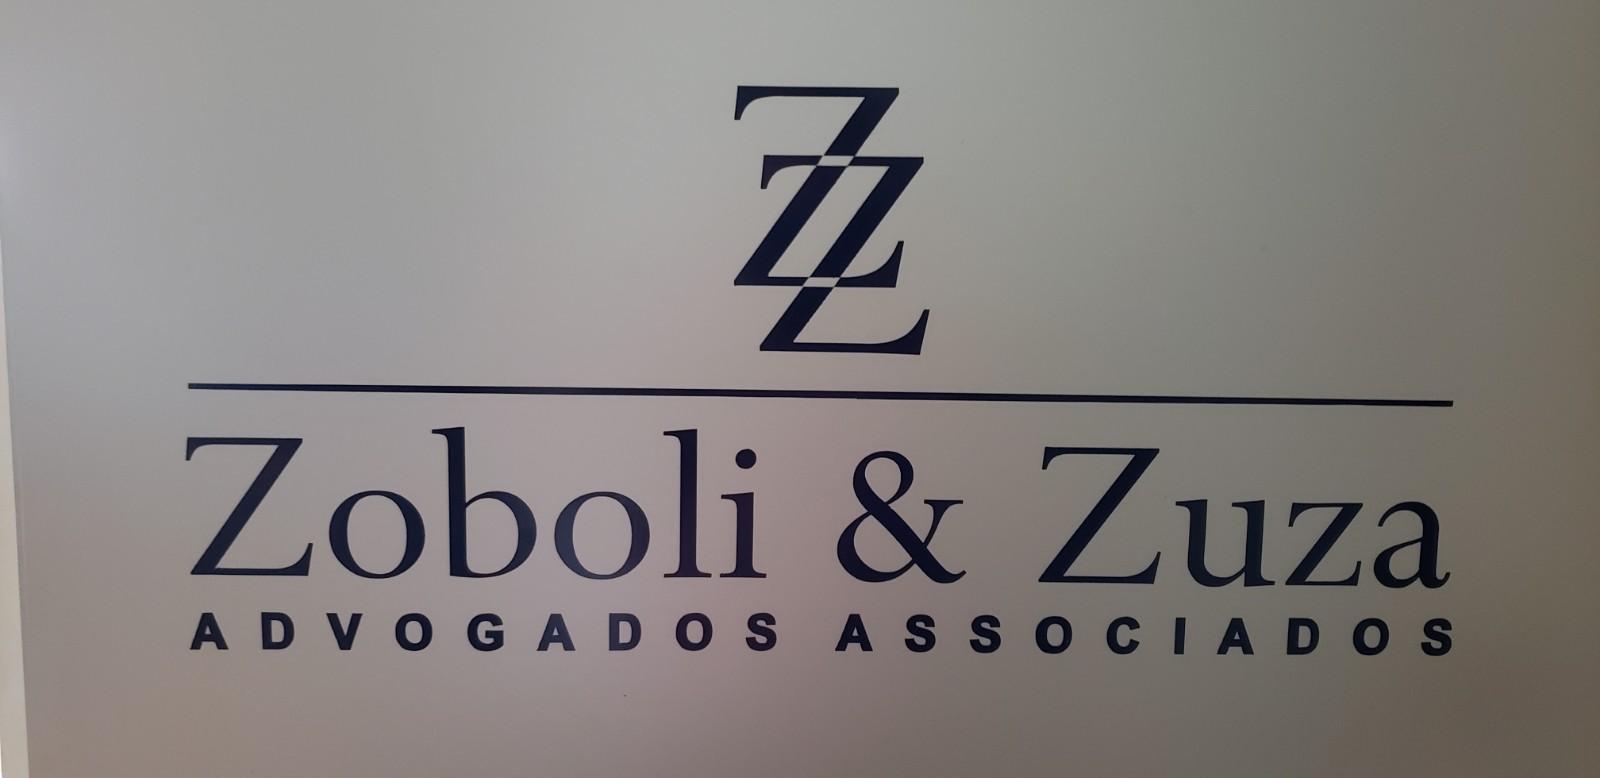 Placa de Entrada - Zoboli & Zuza